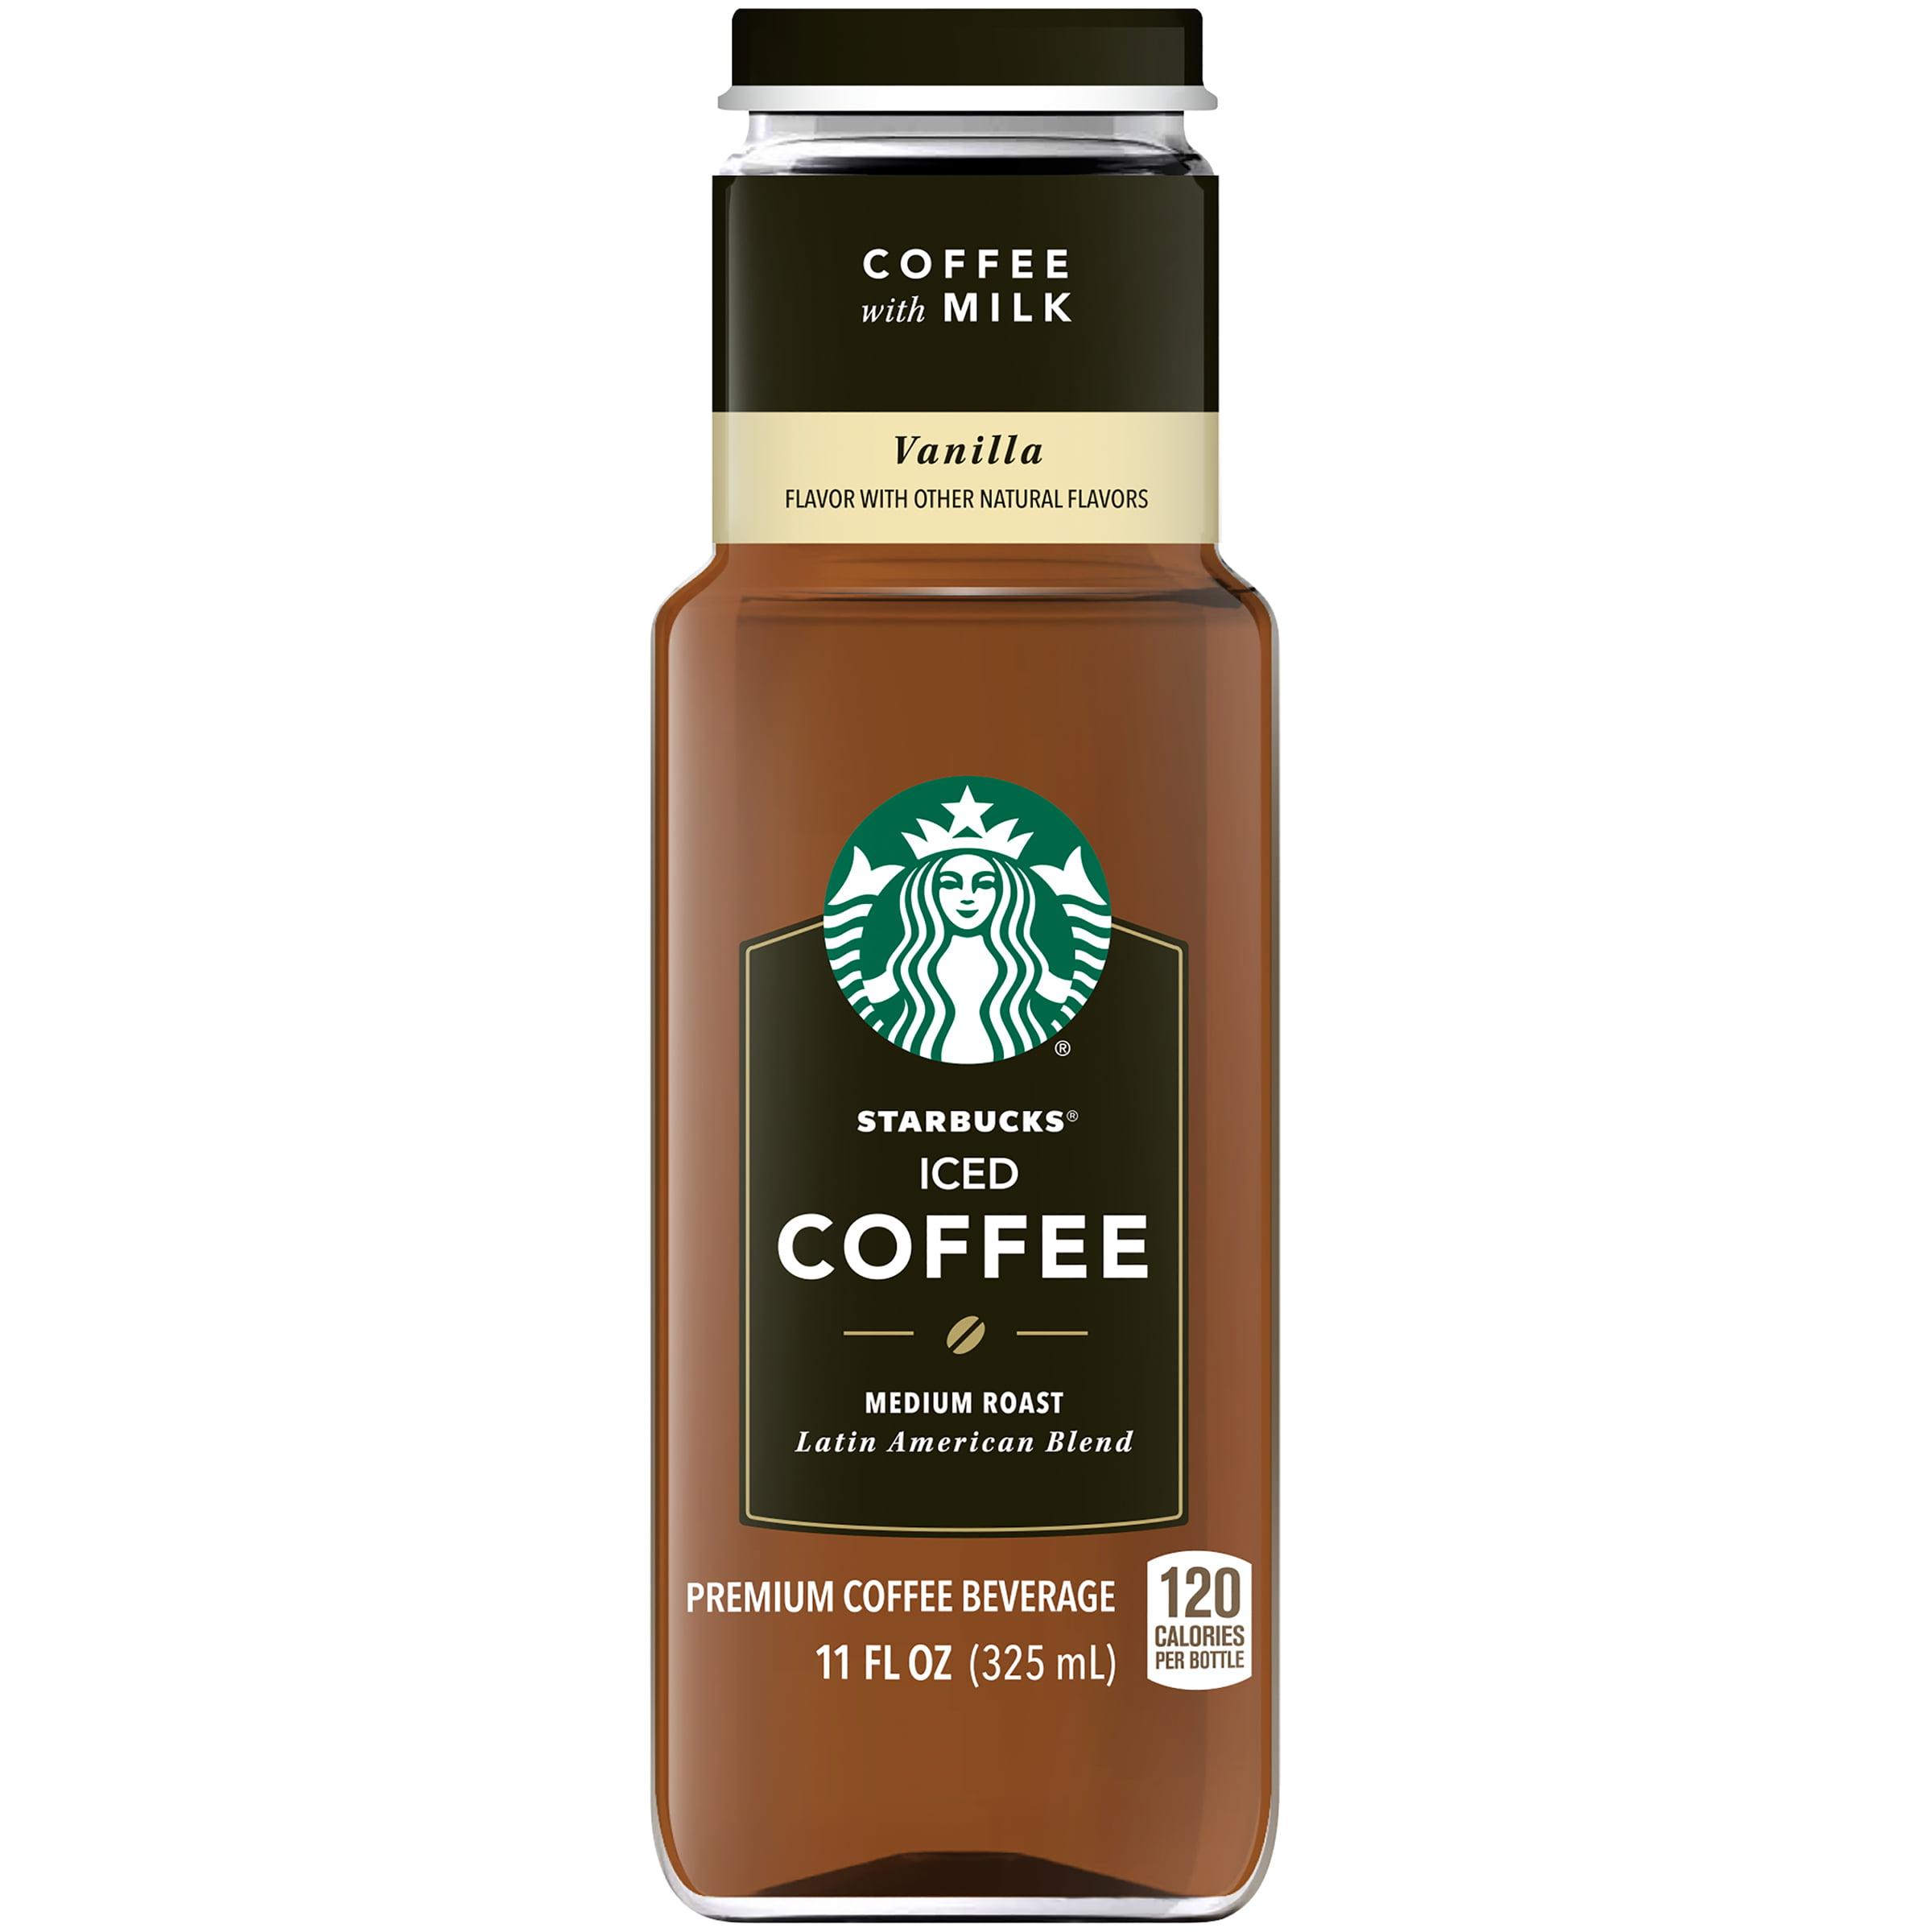 Starbucks Medium Roast Vanilla Iced Coffee, 11 Fl. Oz.